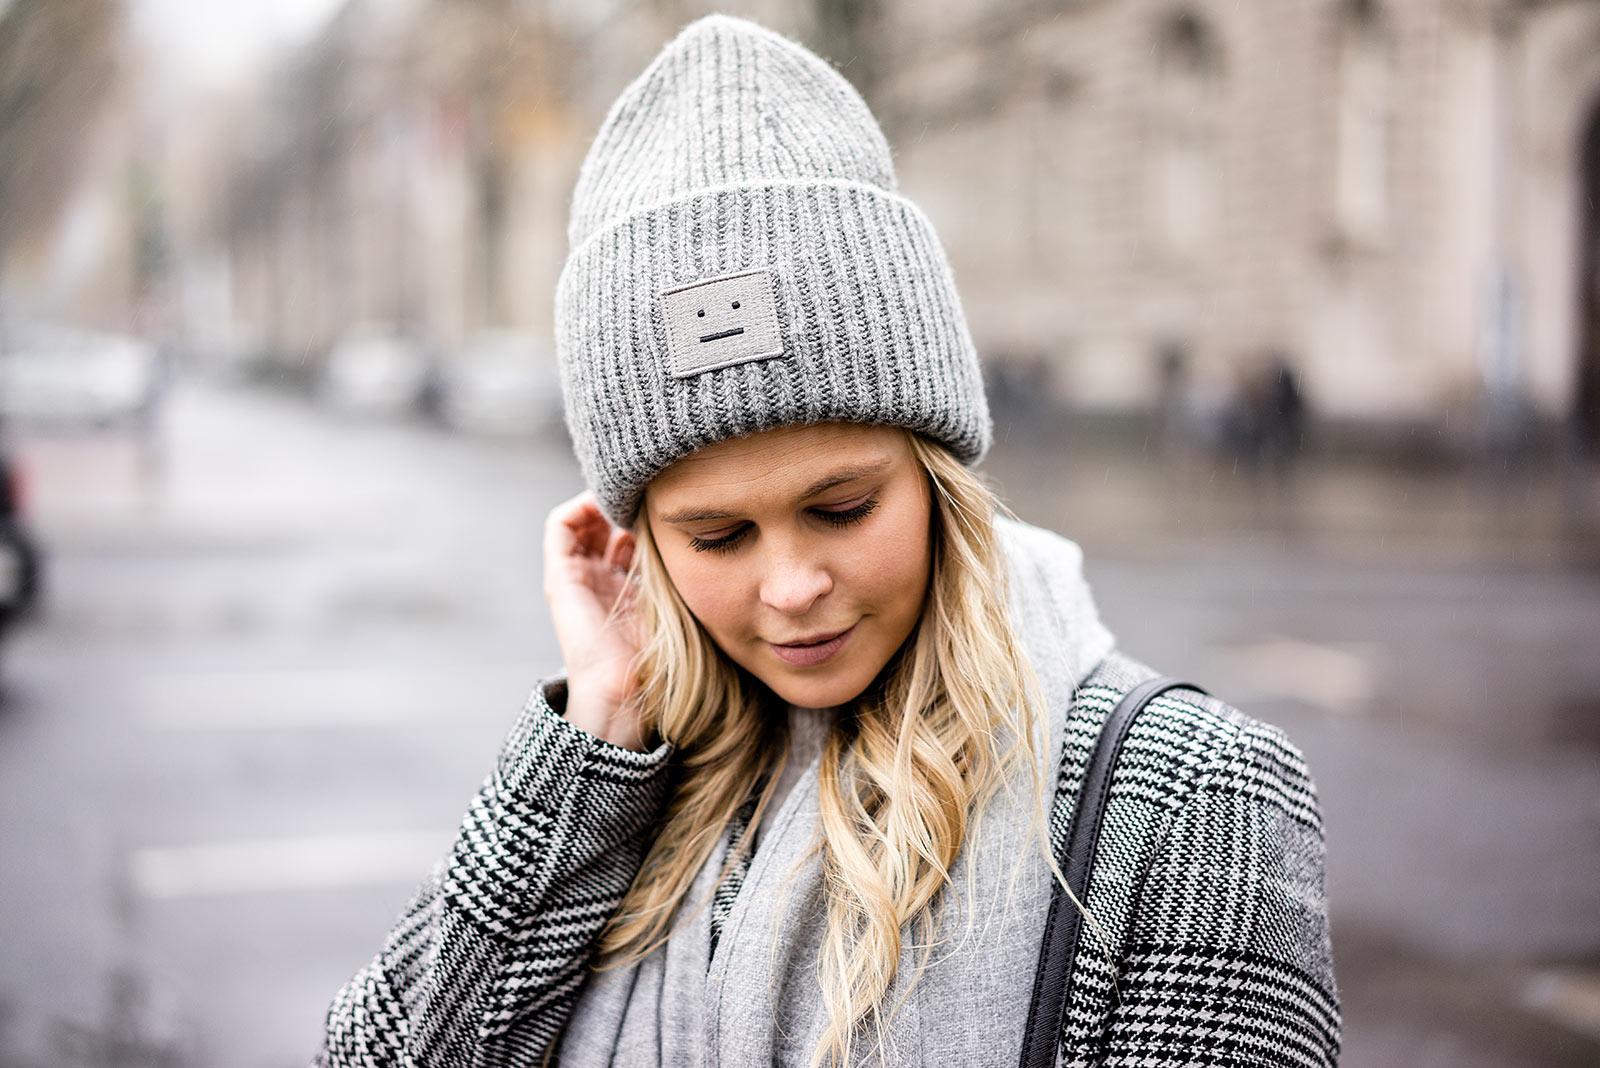 Acne Studios Mütze grau mit Gesicht Winter-Accessoires Blog Sunnyinga